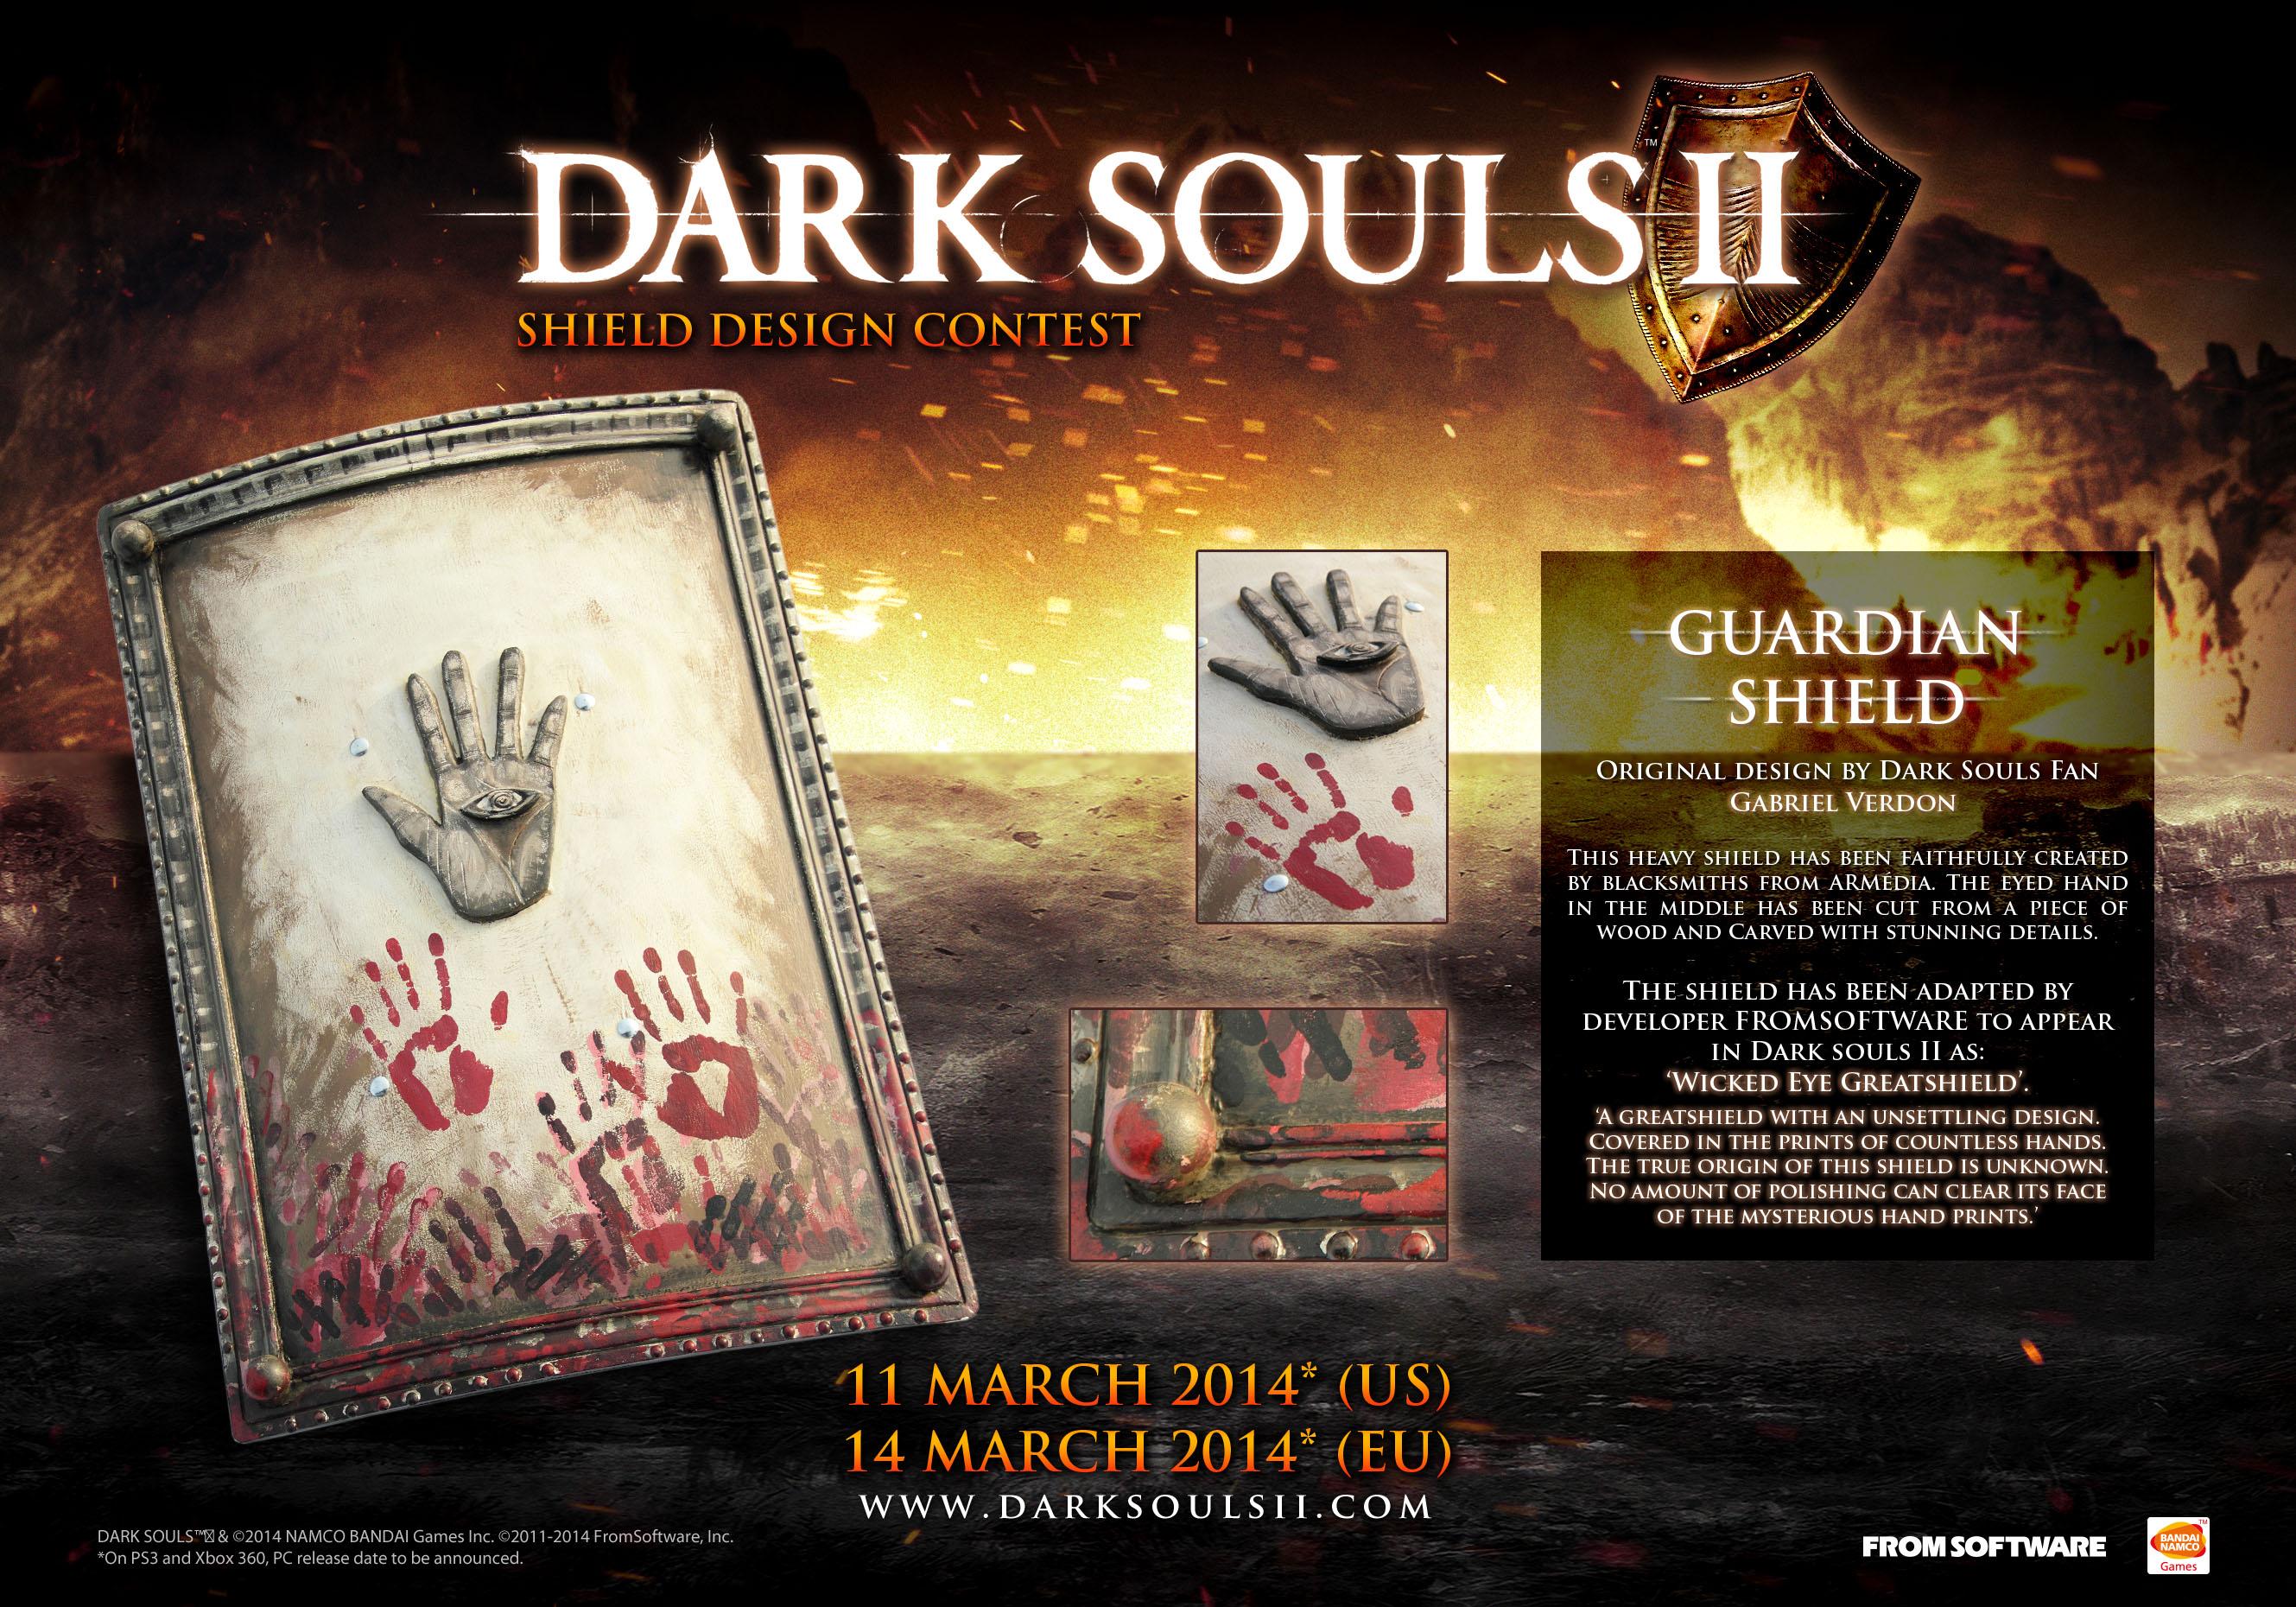 Dark Souls 2 Screenshots Unveil Two Amazing Shields #30434